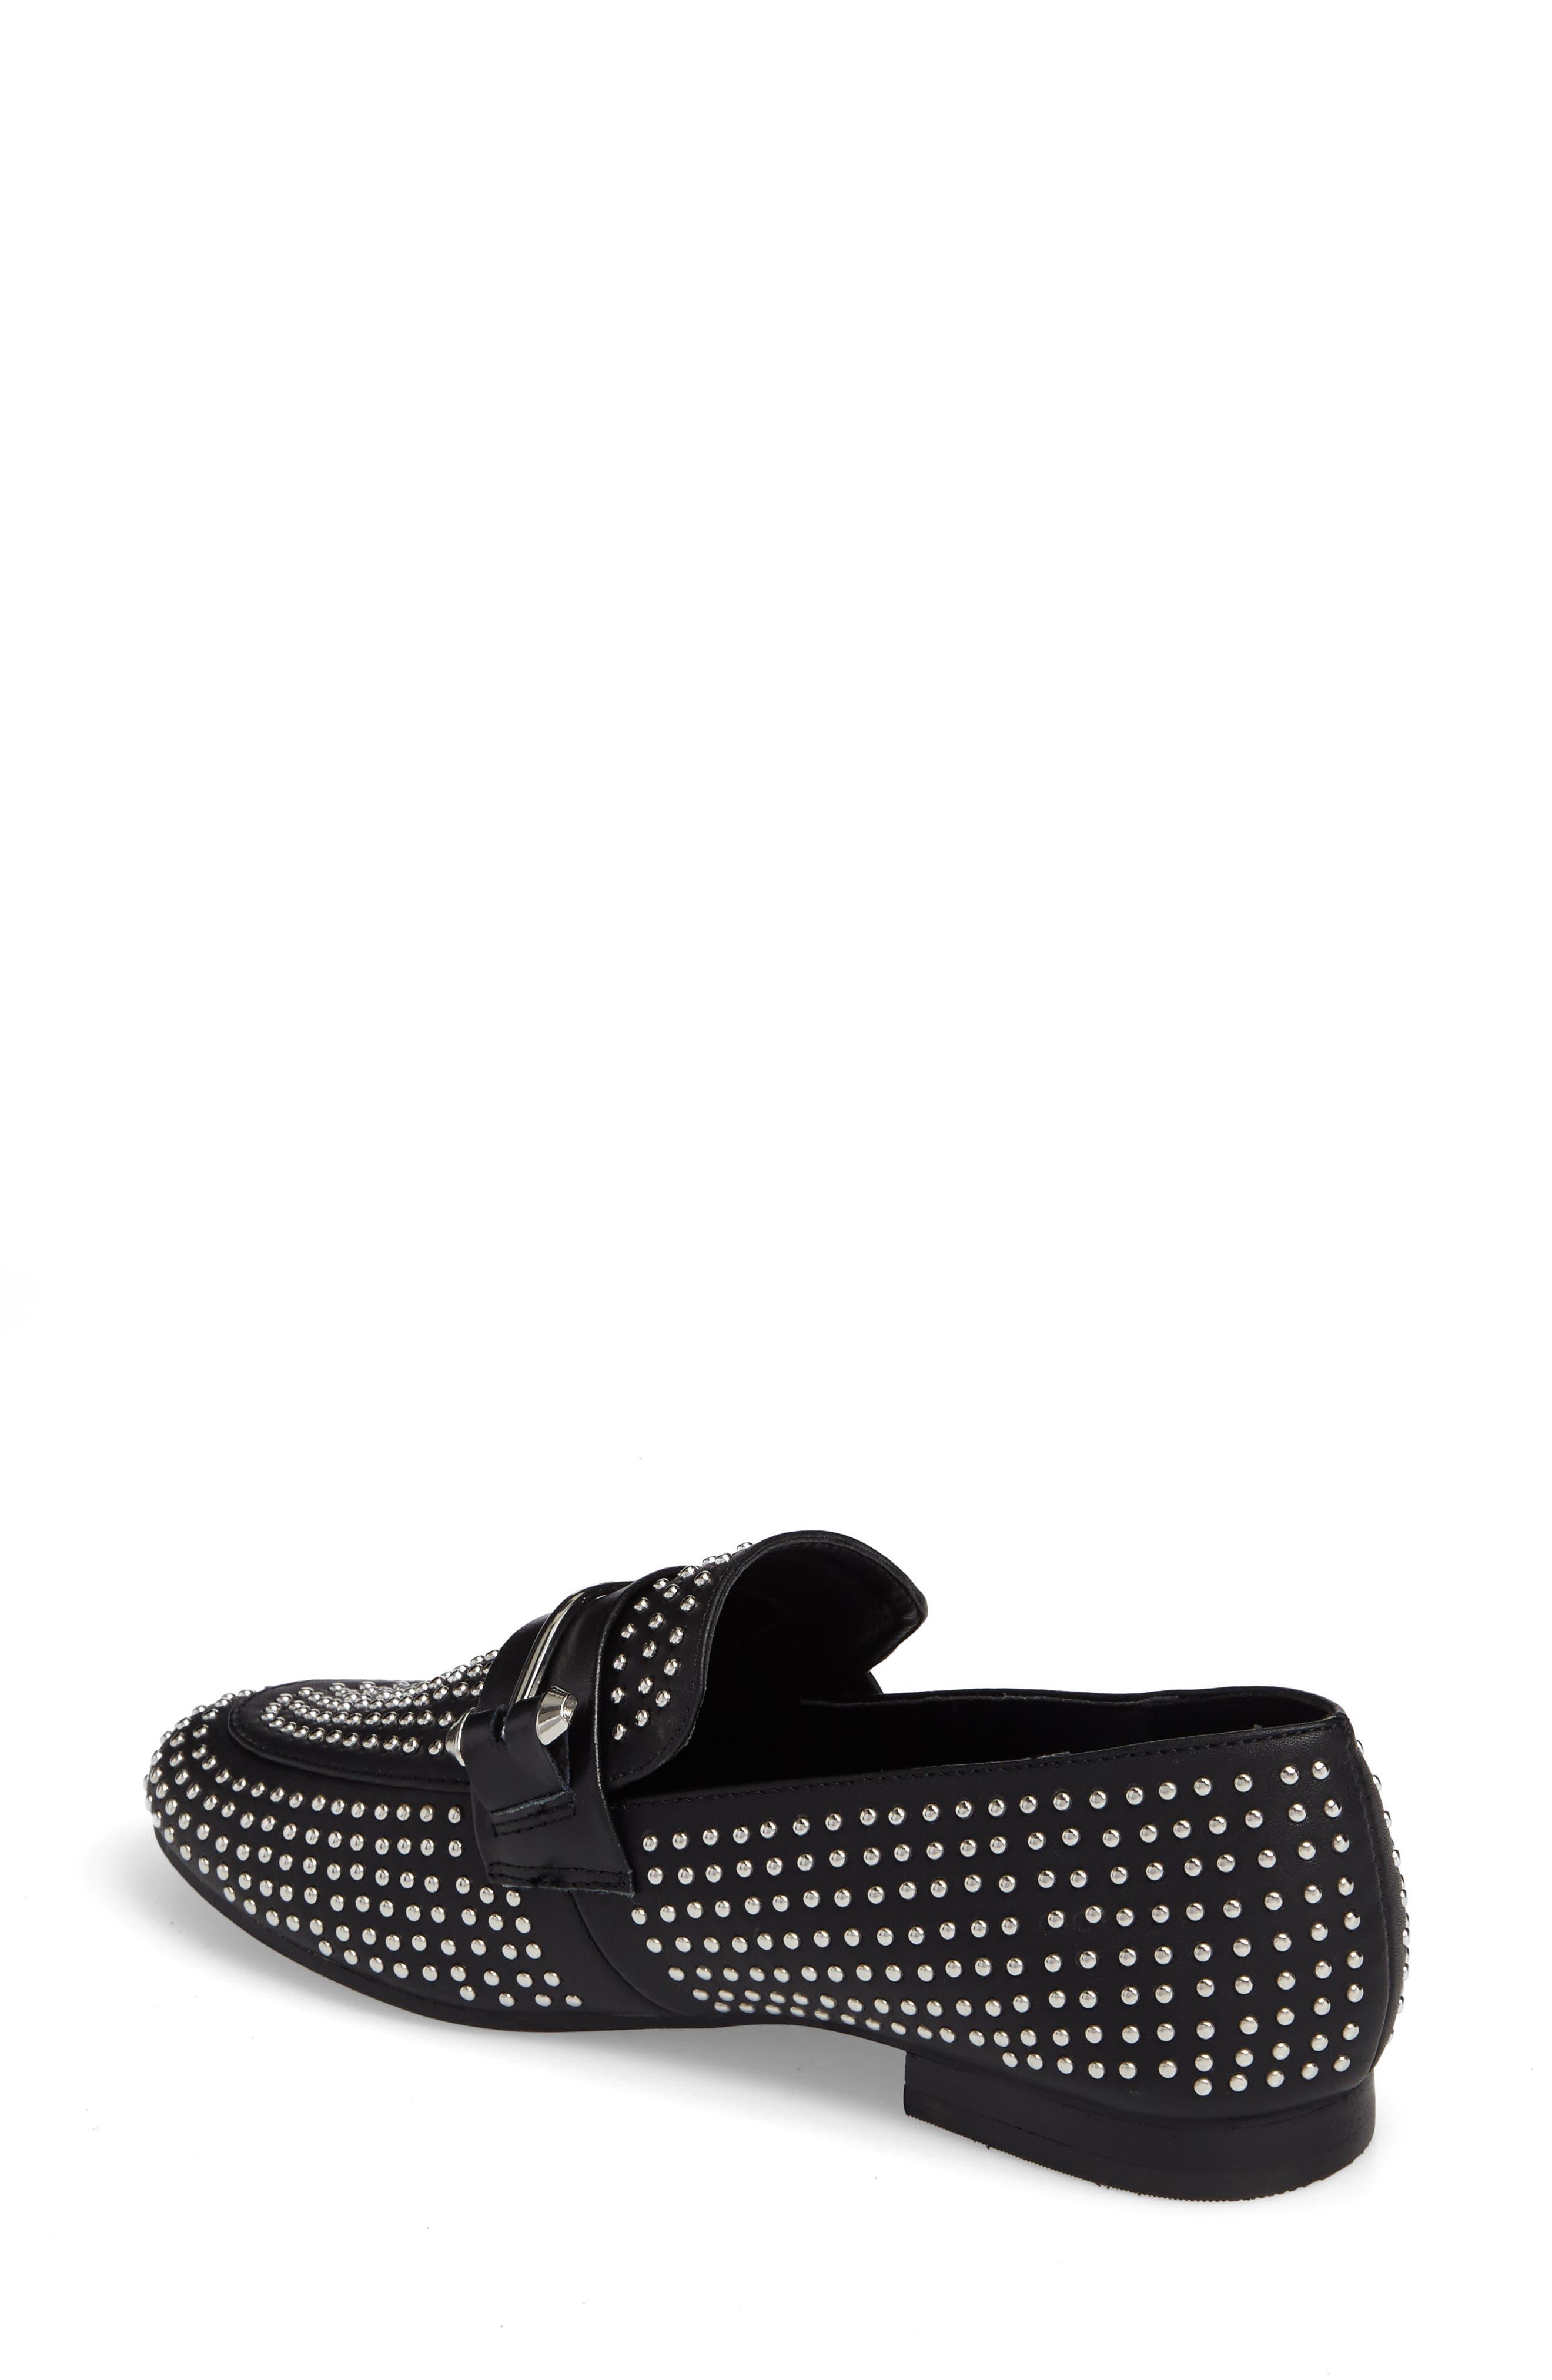 Kast Studded Loafer,                             Alternate thumbnail 2, color,                             Black Faux Leather